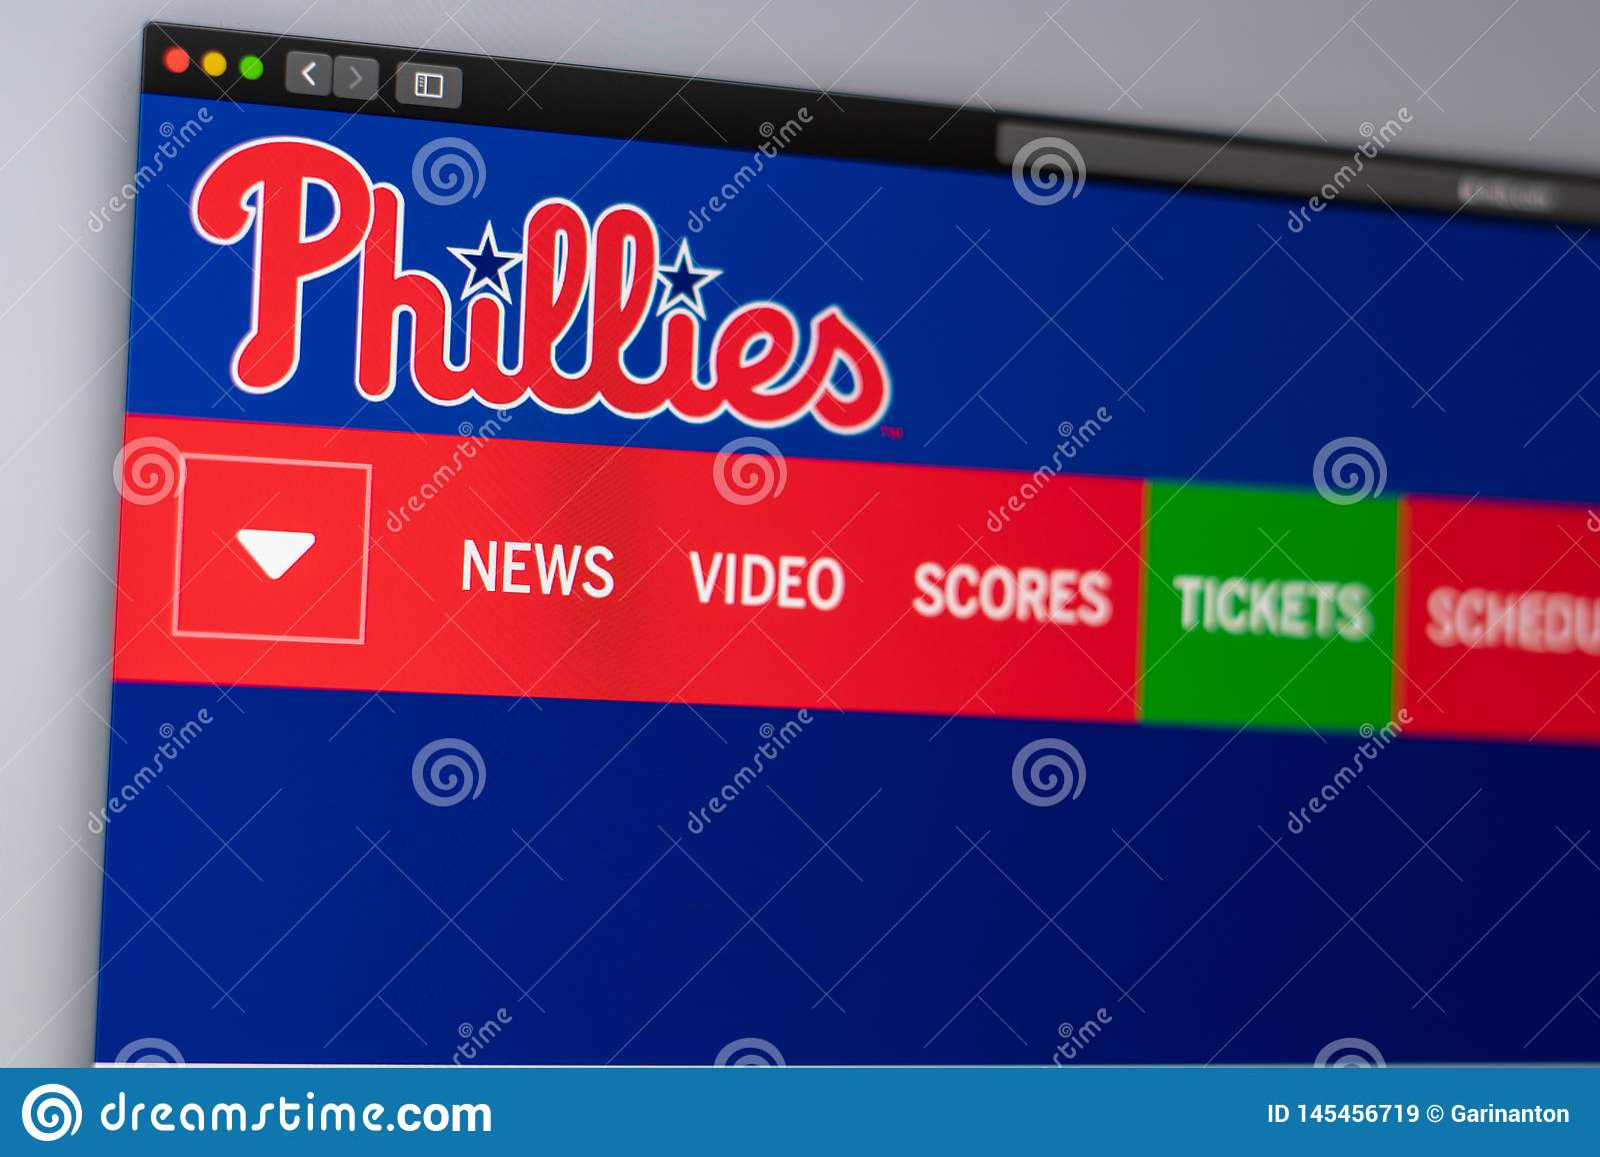 Baseball team Philadelphia Phillies website homepage. Close up of team logo.